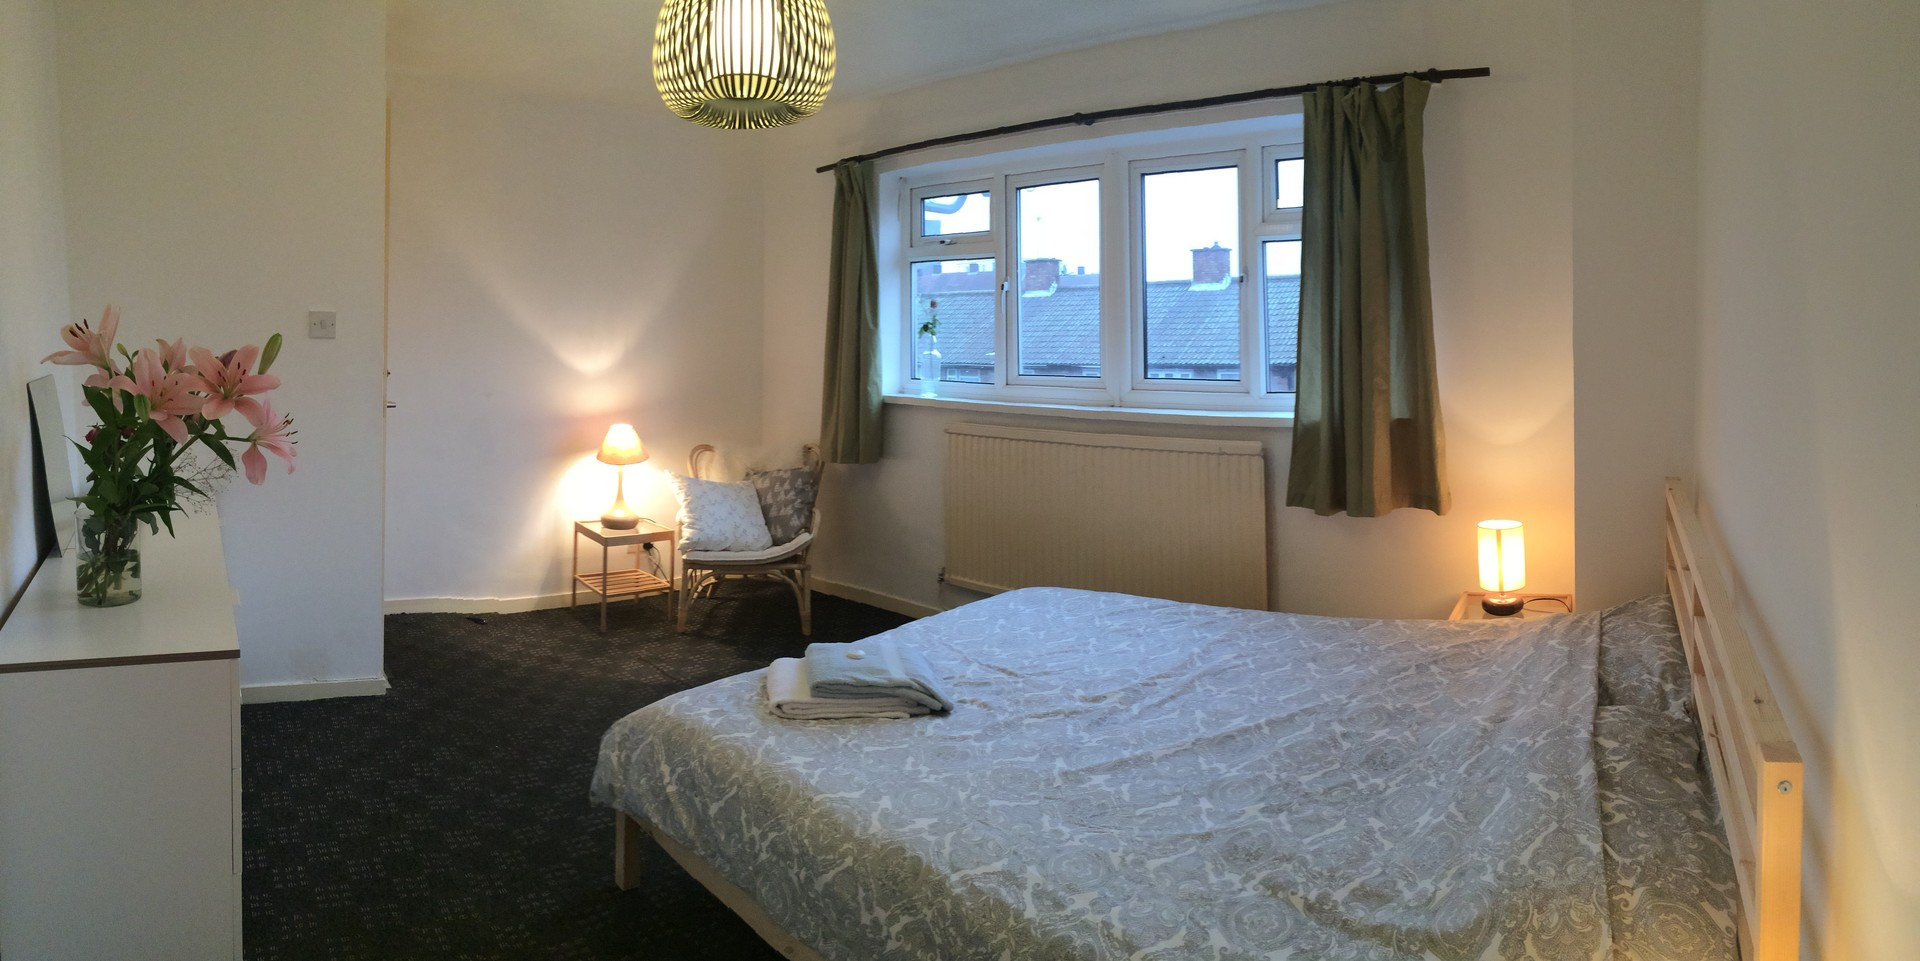 Nice spacious house in Zone 2 West Ham, Startford